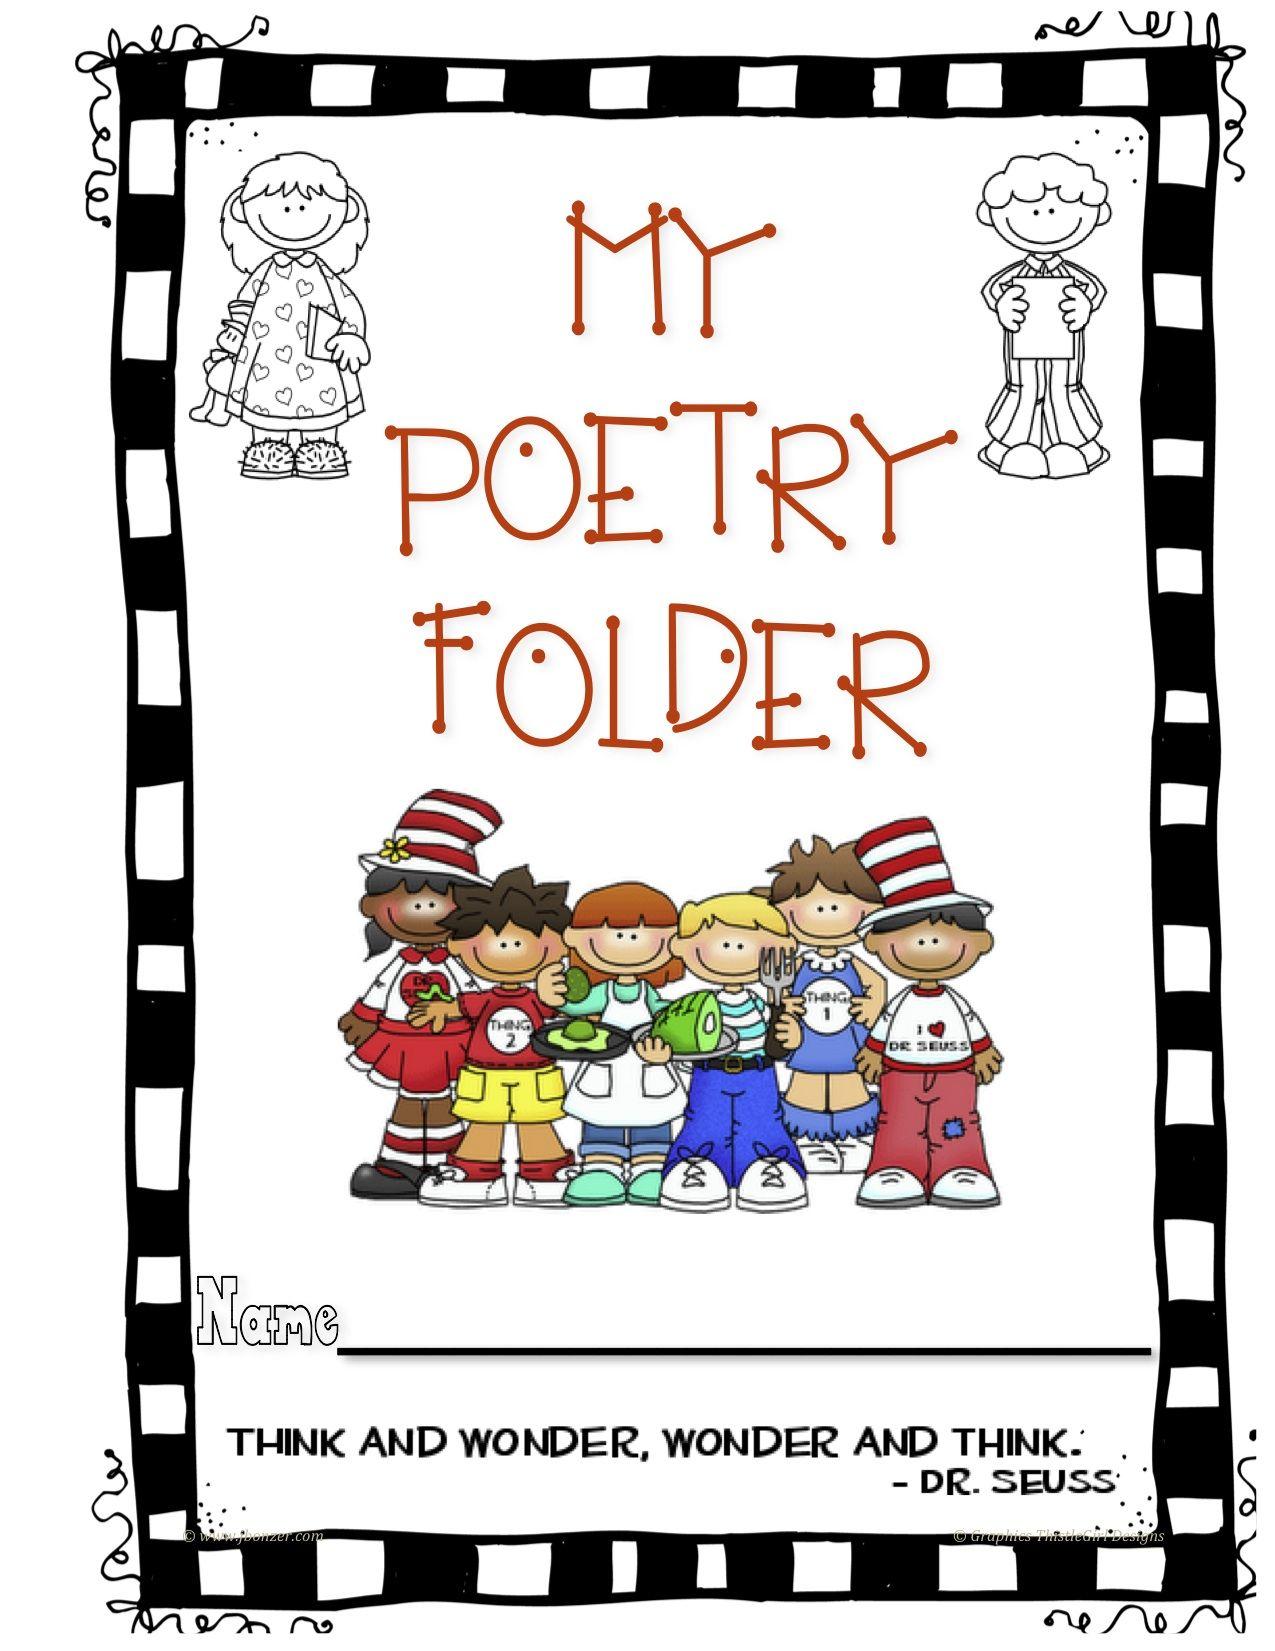 Kindergarten Poetry Book Cover : Poetry folder cover for my students pinterest school